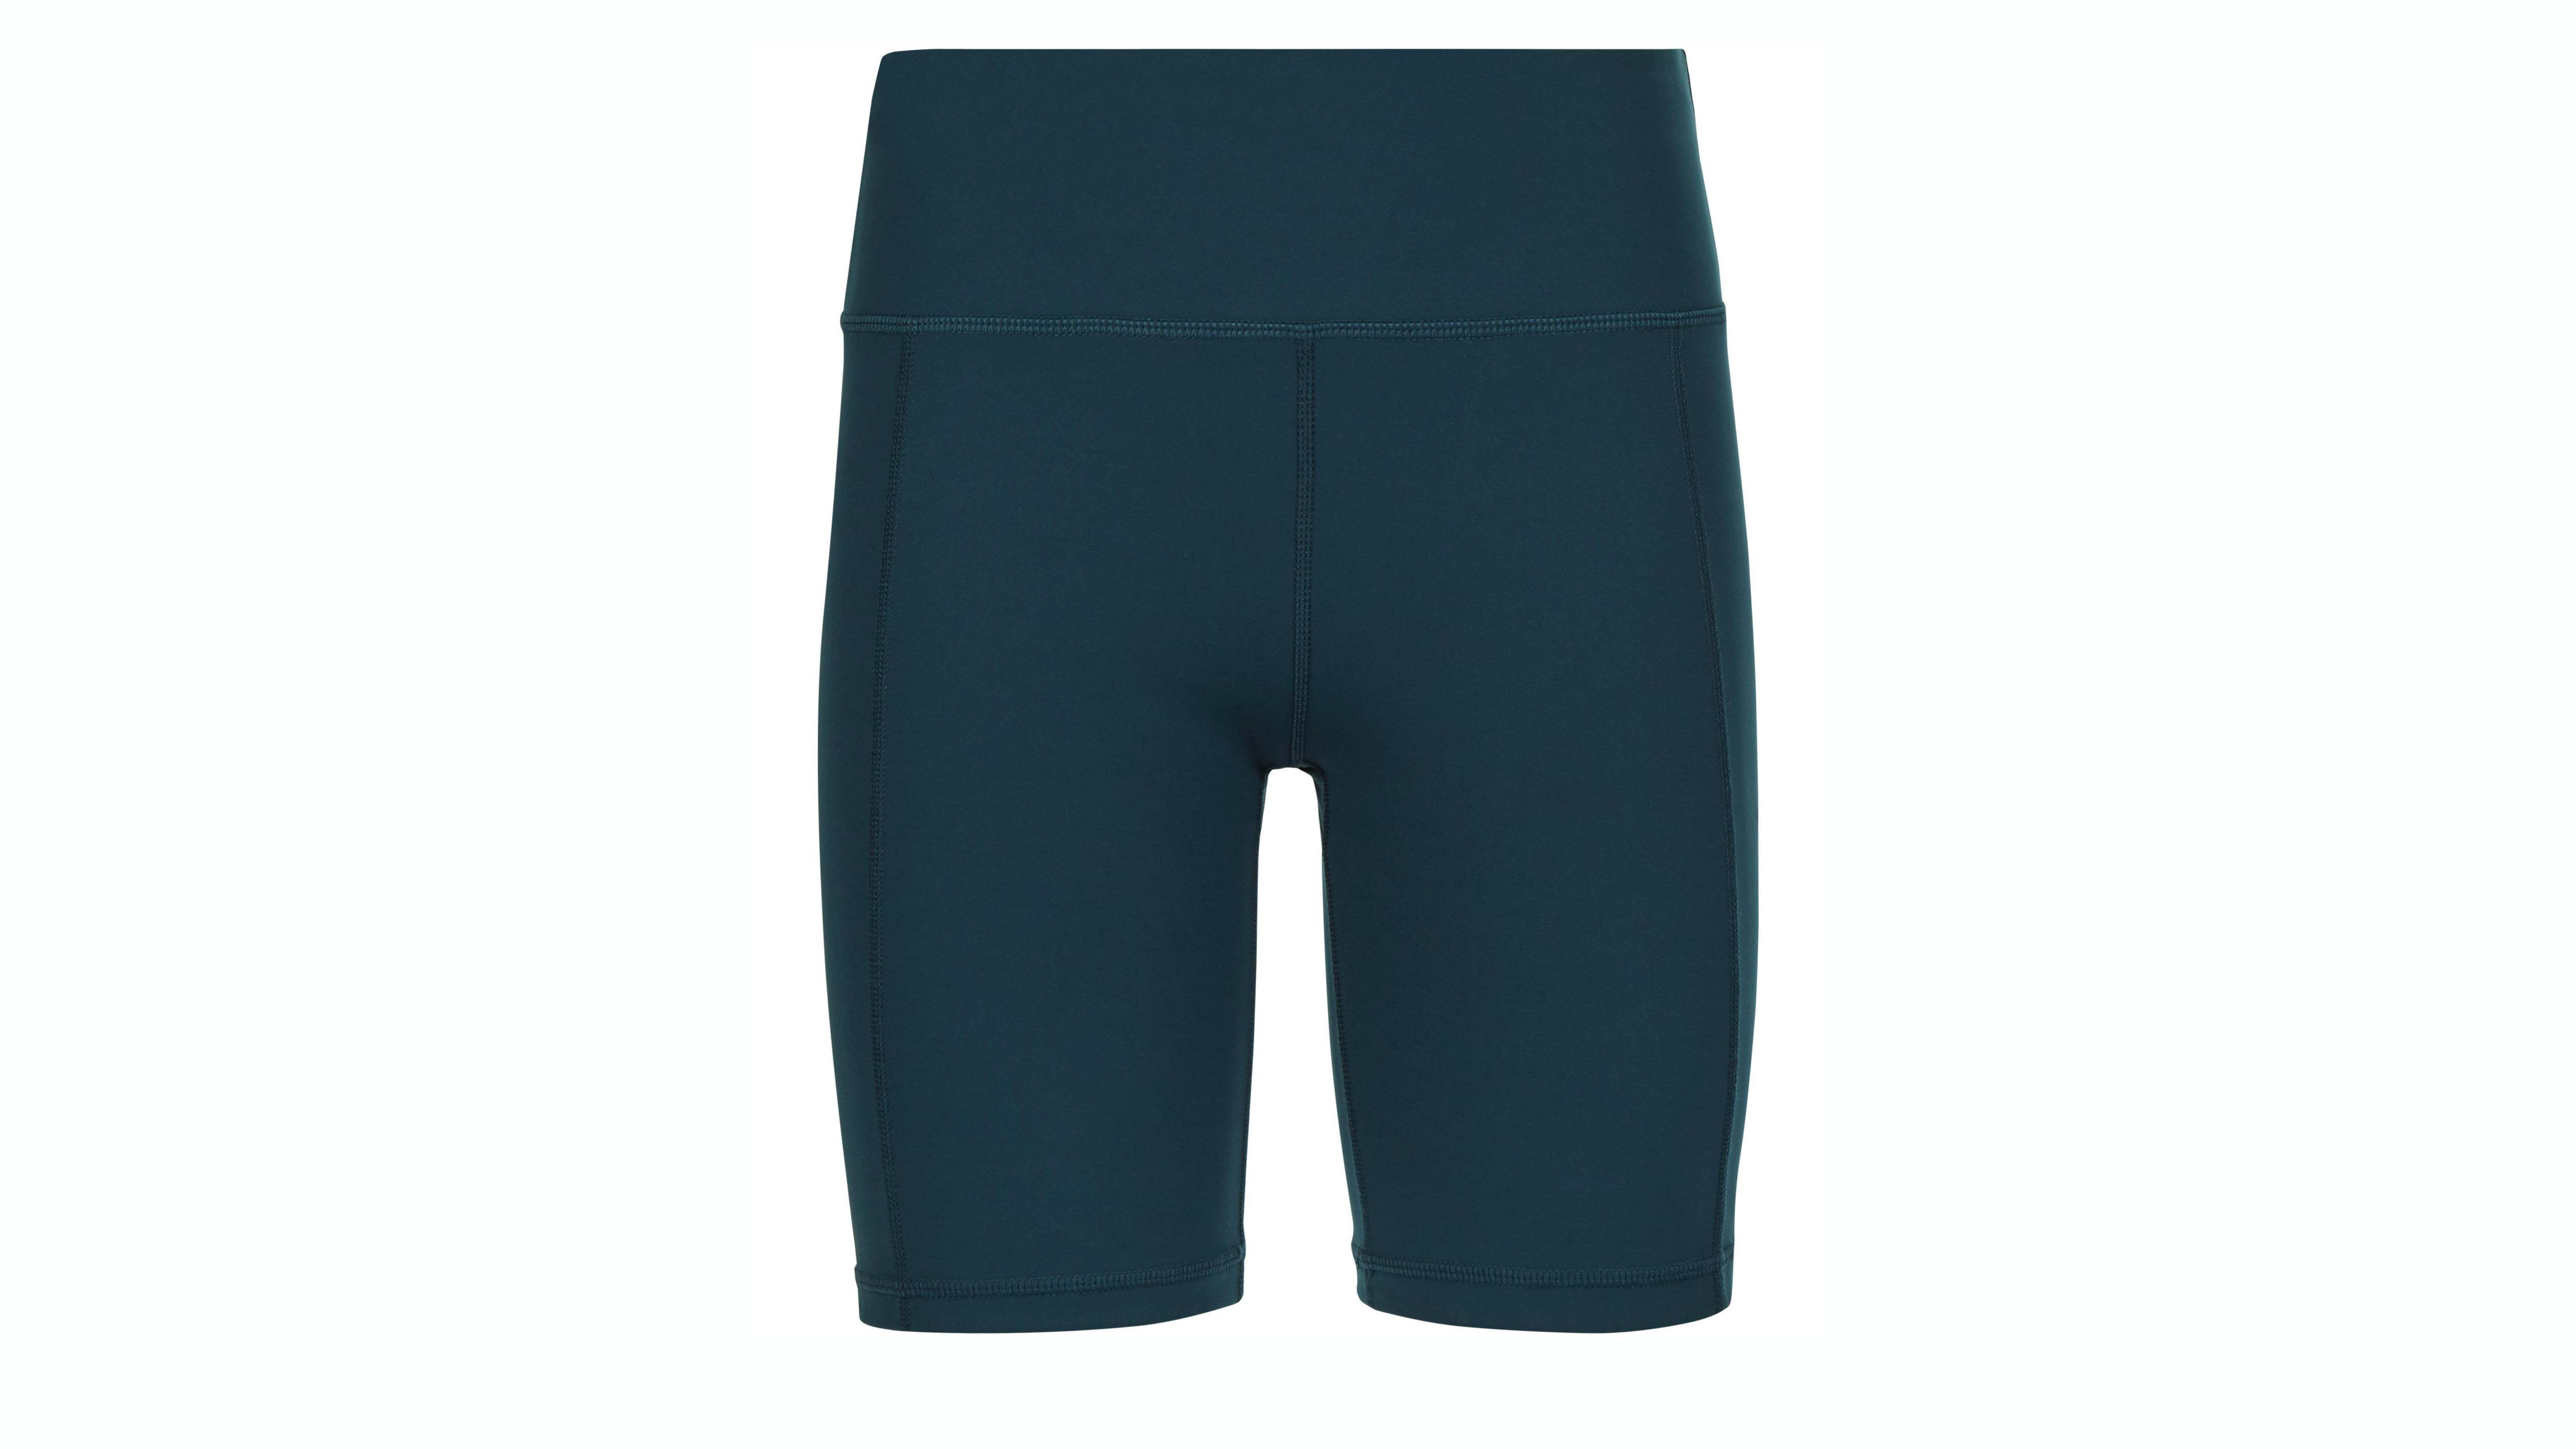 The women's for shorts best running summer 4LcAR35jq